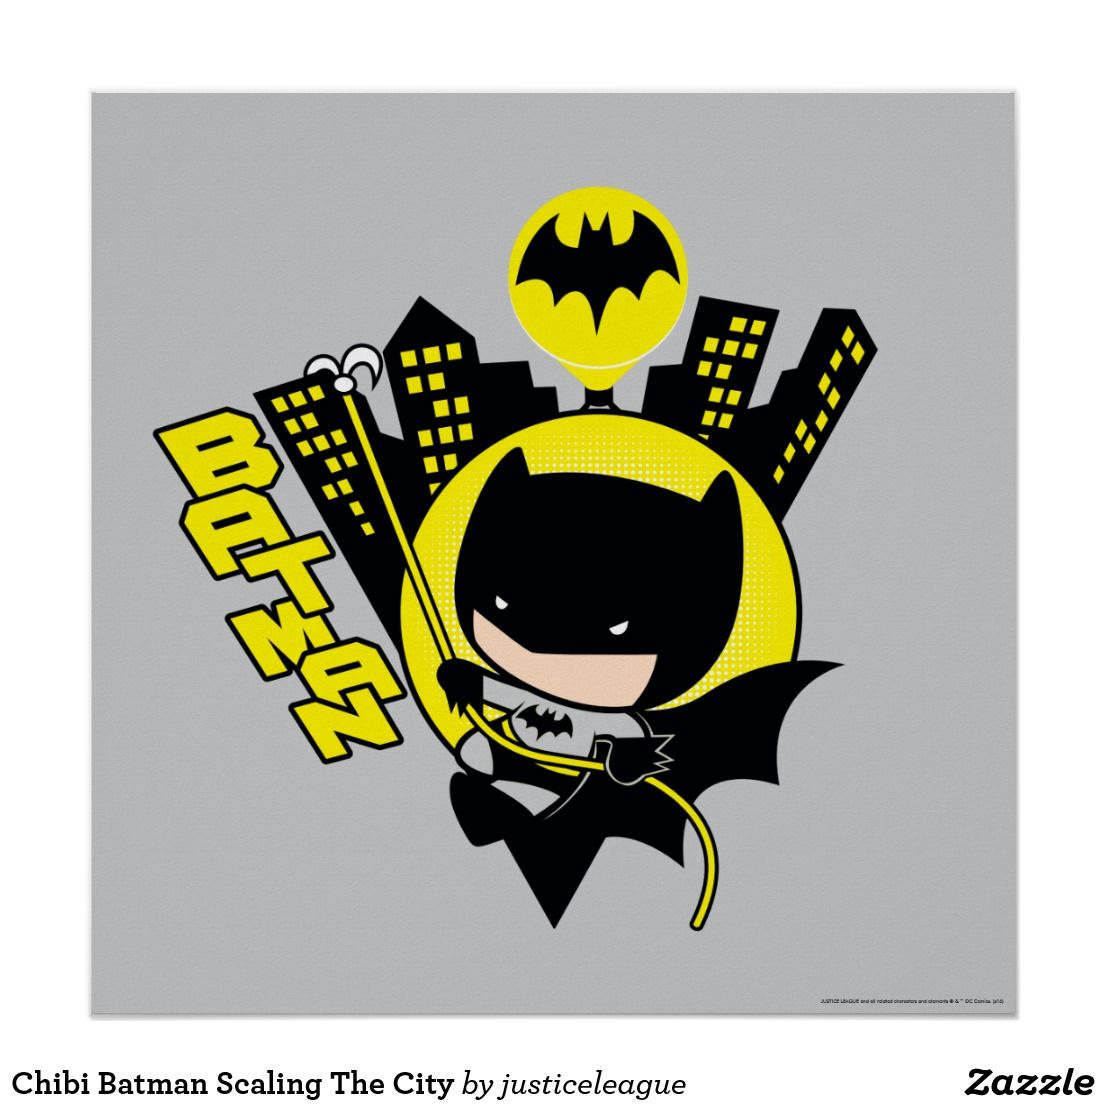 Chibi Batman Scaling The City Poster Zazzle Com Chibi Batman Batman Wallpaper